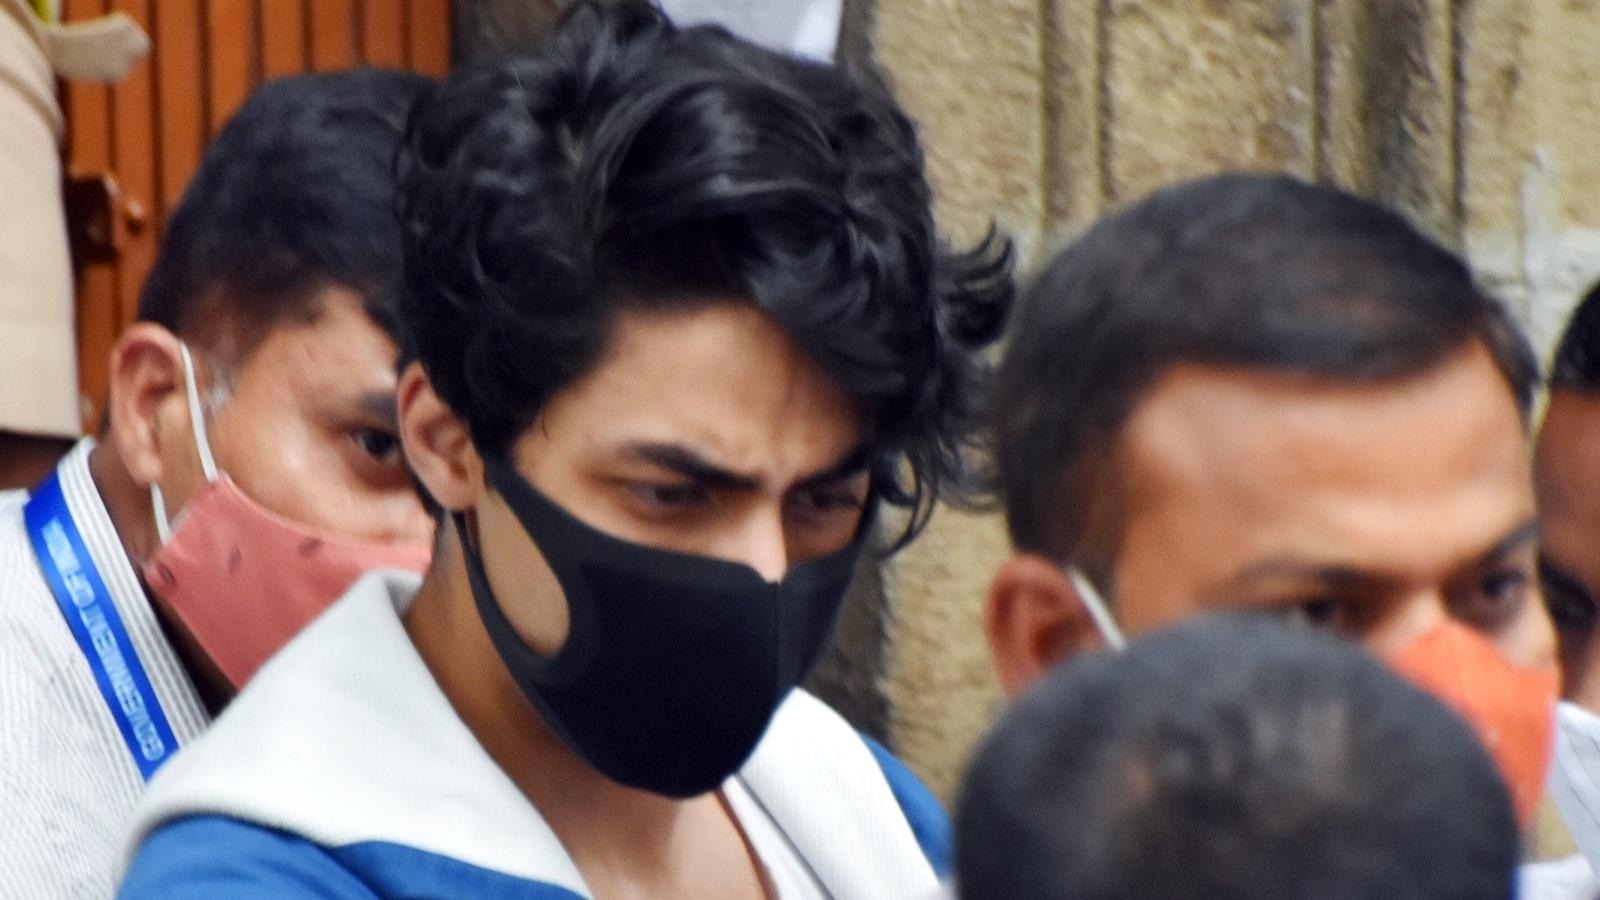 In seeking bail for Aryan Khan, his lawyer praises NCB